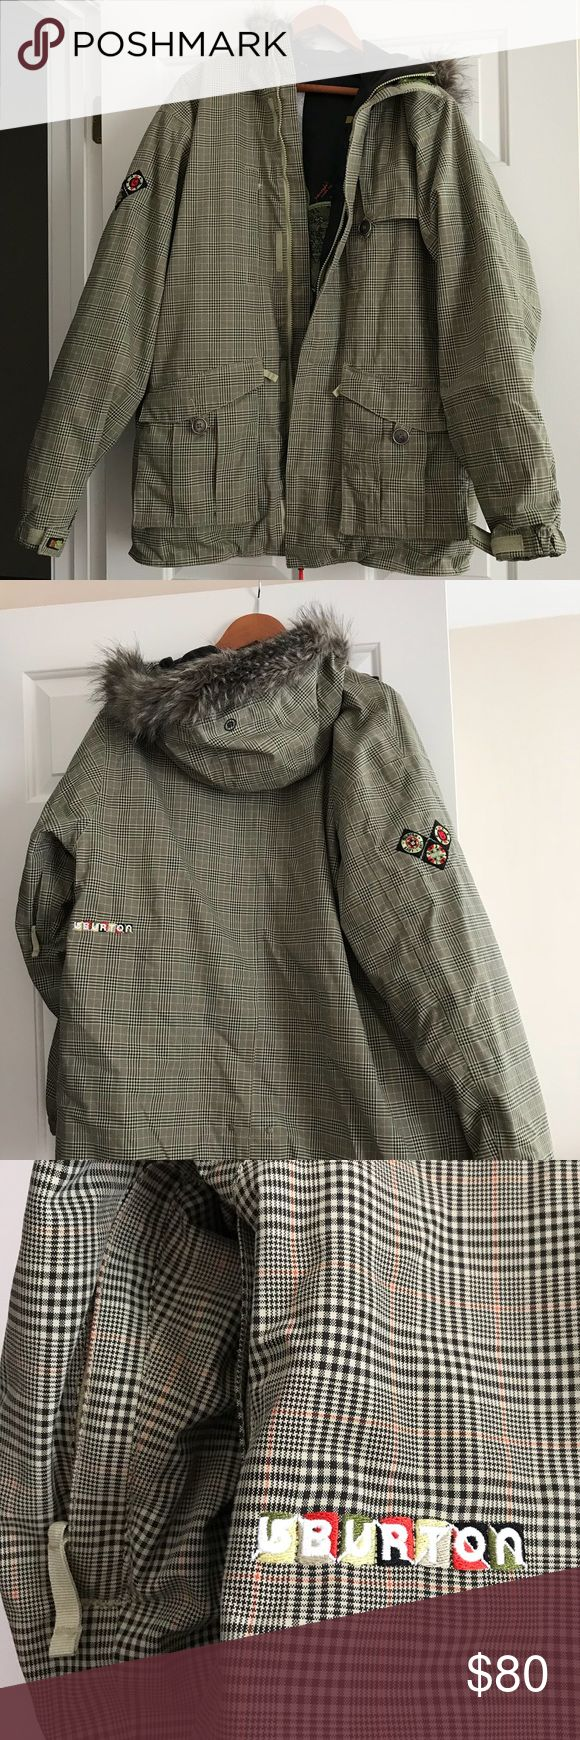 Burton Ski Jacket Just in time for ski season! Men's ski jacket in great condition! Burton Jackets & Coats Ski & Snowboard